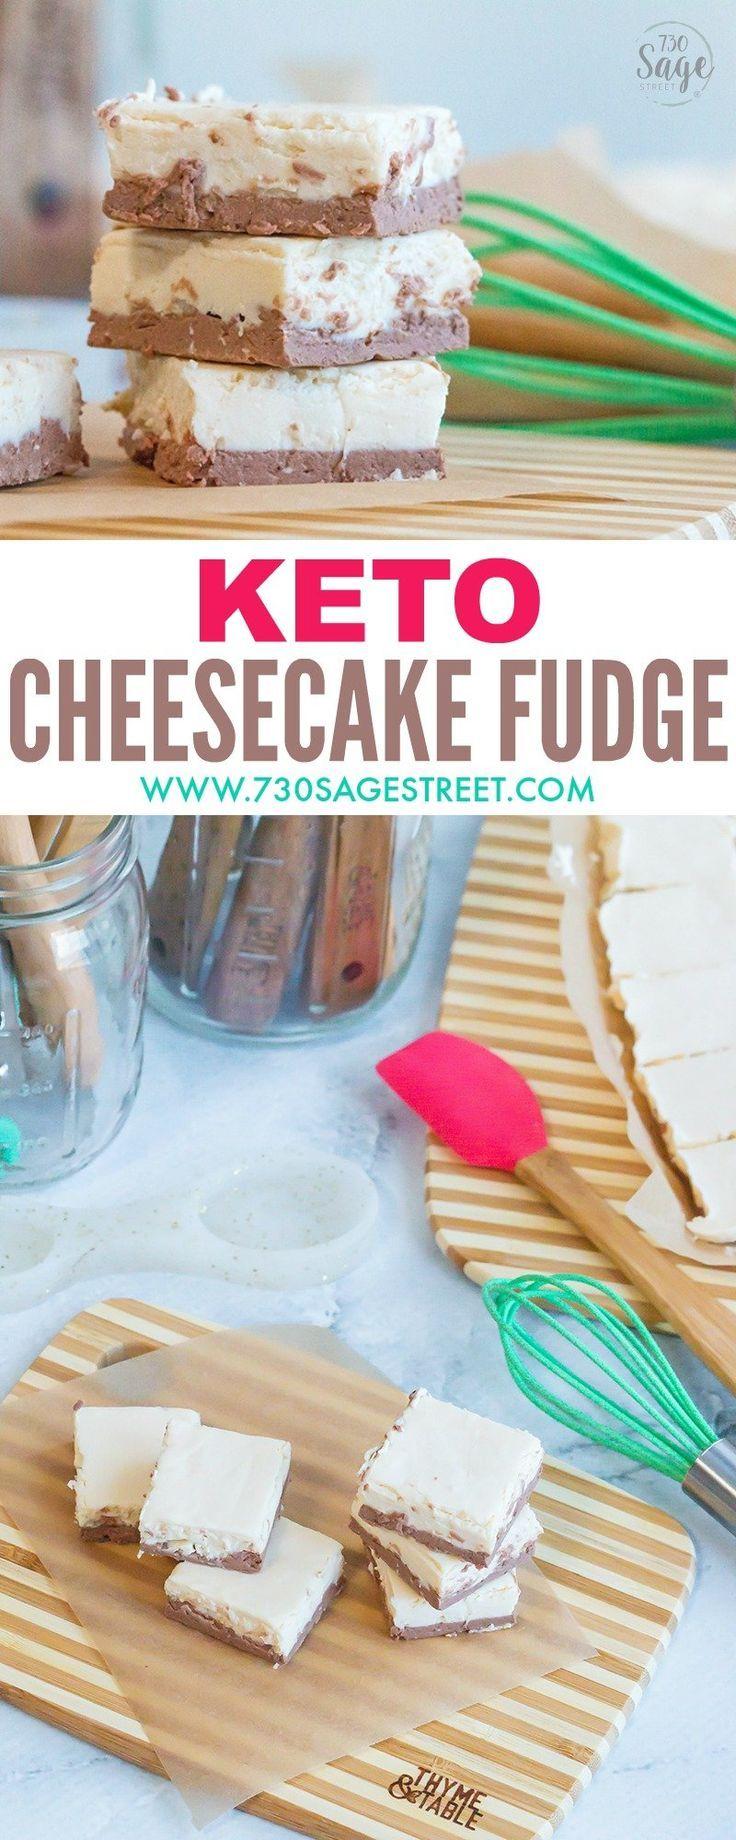 Cheesecake fudge keto candy keto cheesecake